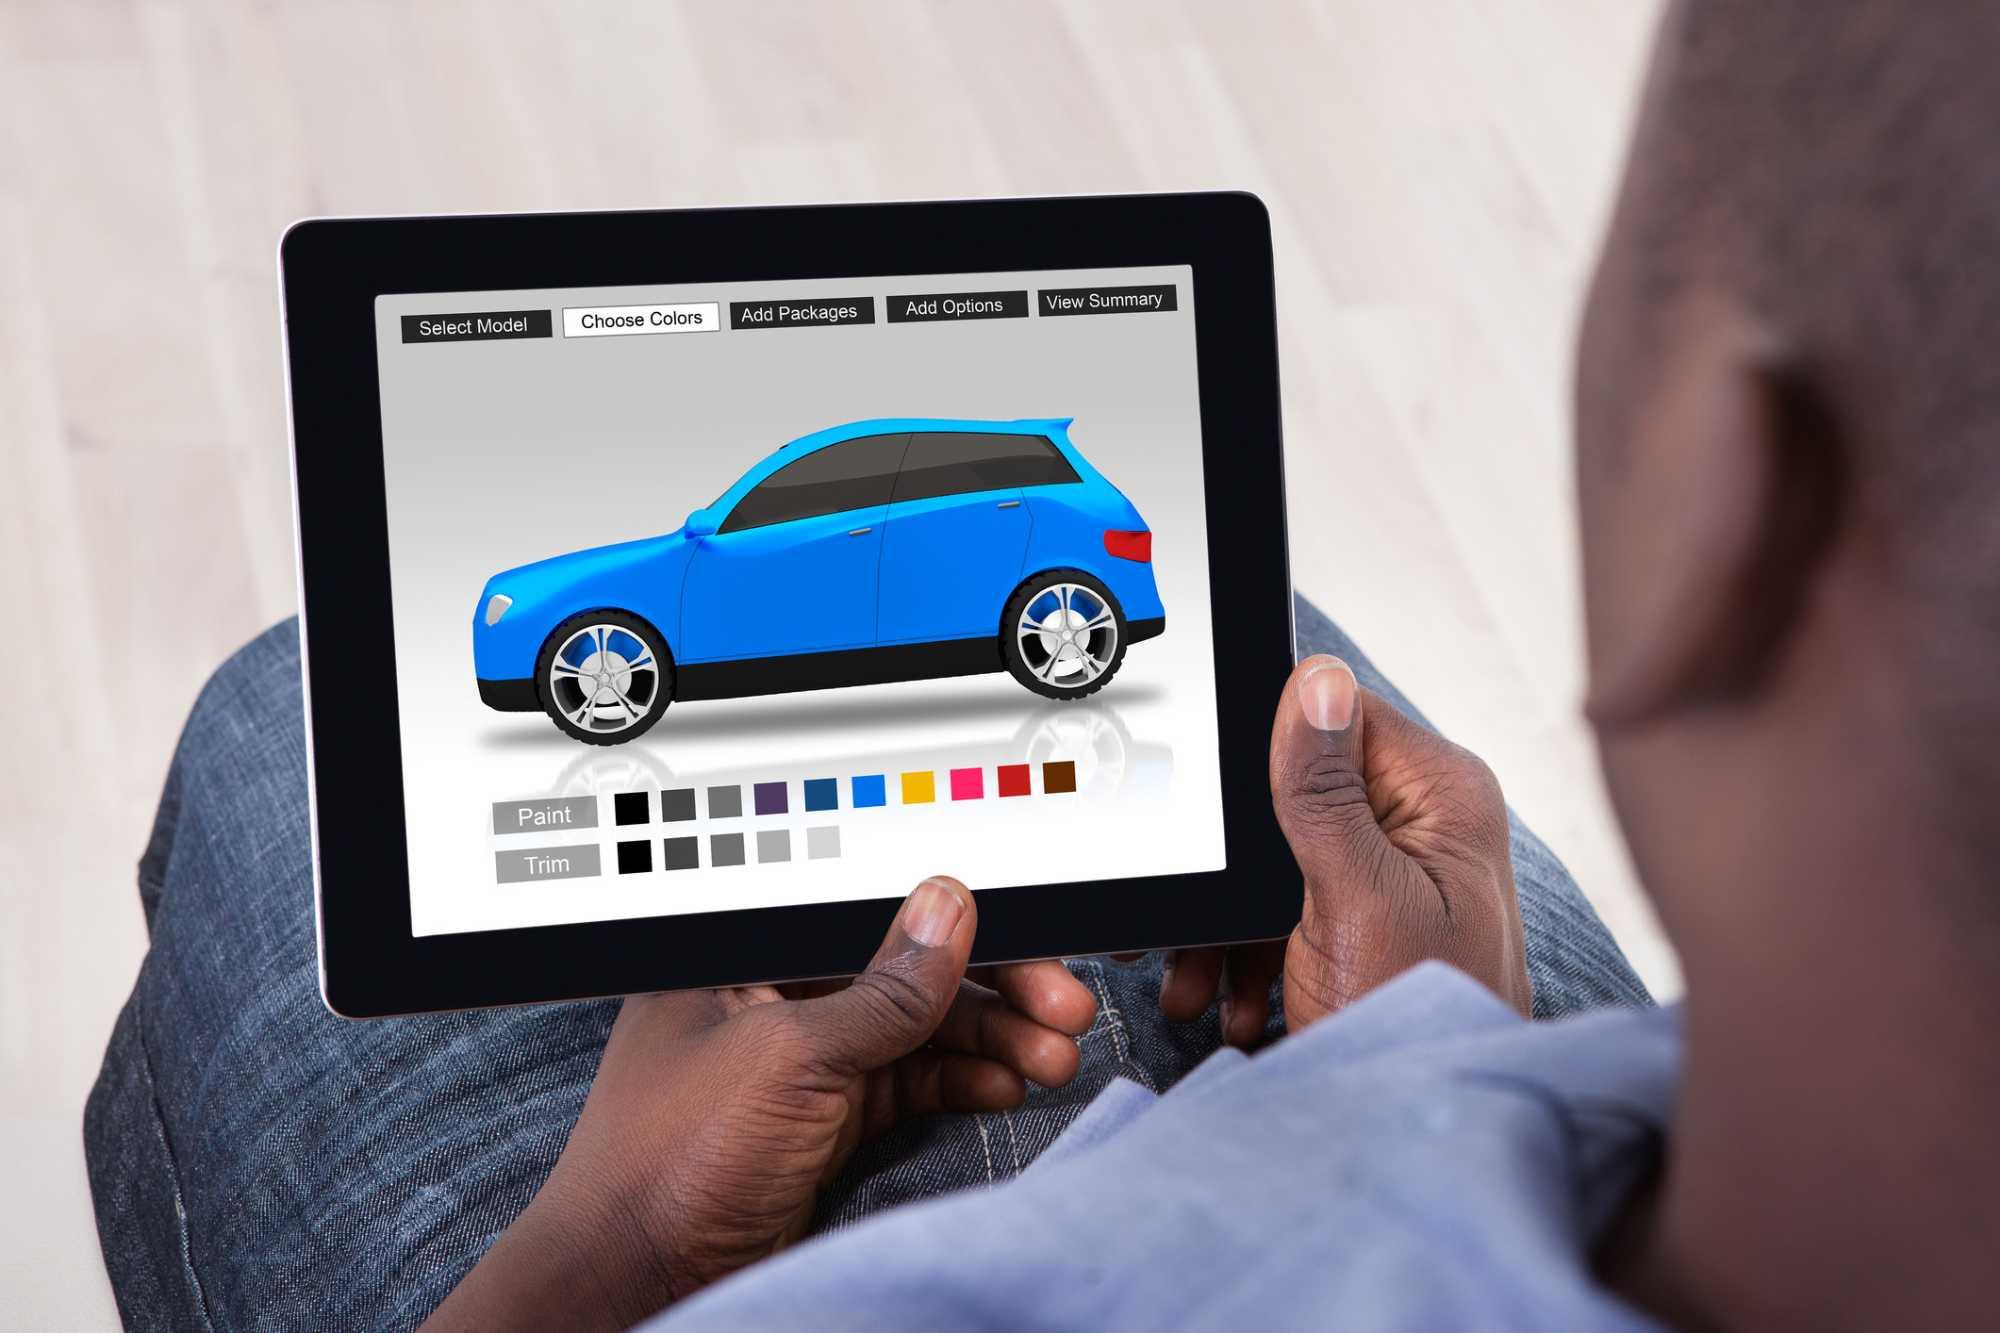 comprar carro na internet